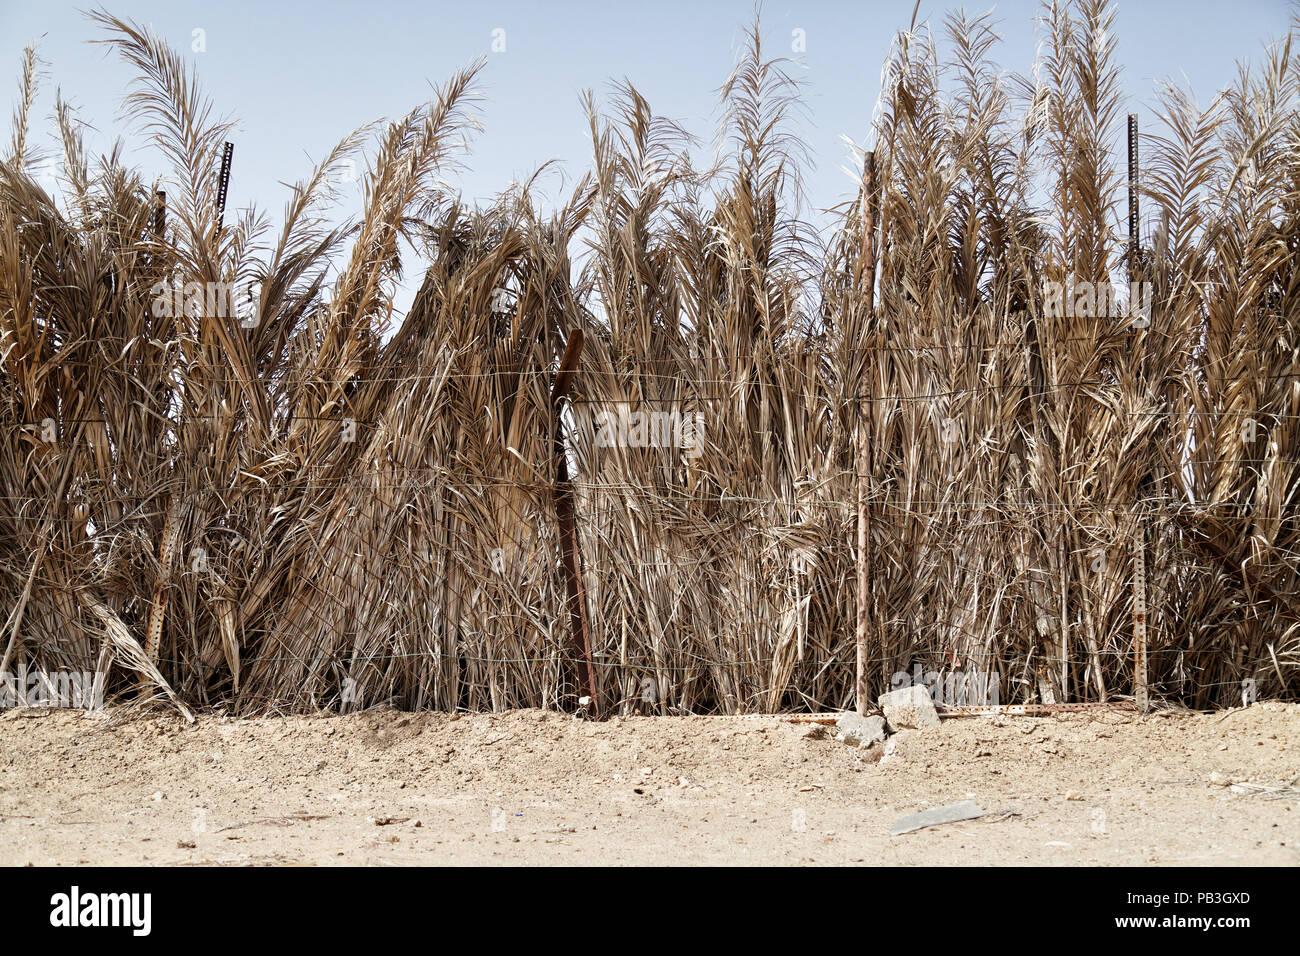 Barasti palm frond fencing - Stock Image